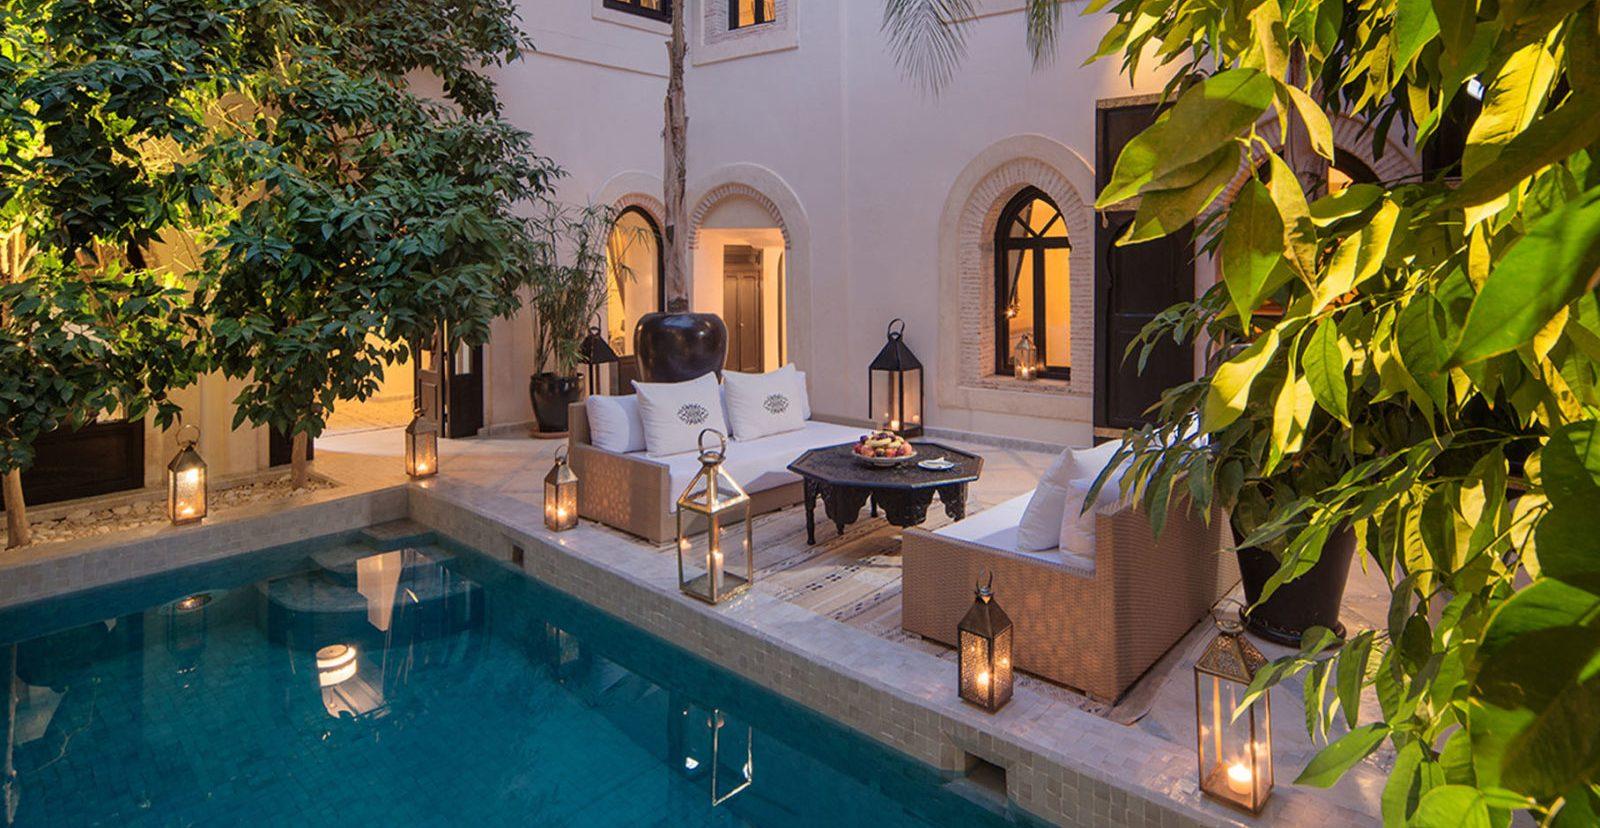 Lighting Trends That Will Embellish Your Outdoor Design